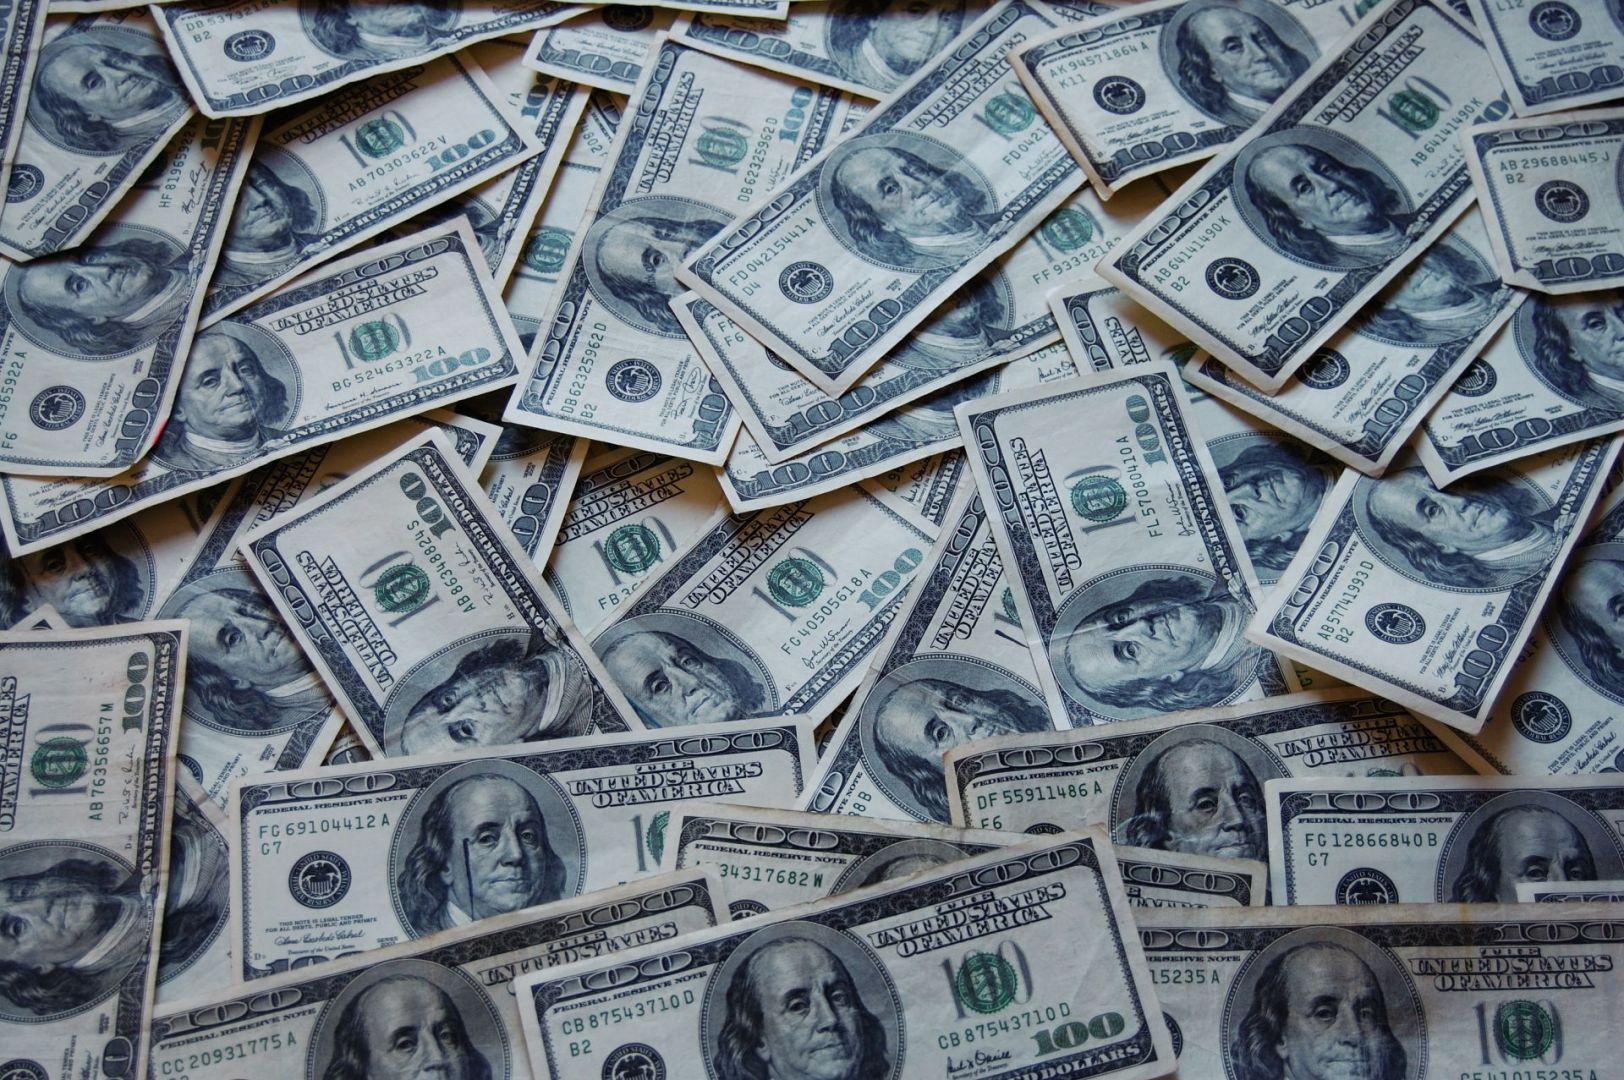 Русские олигархи разбогатели практически на17 млрд долларов запоследний месяц